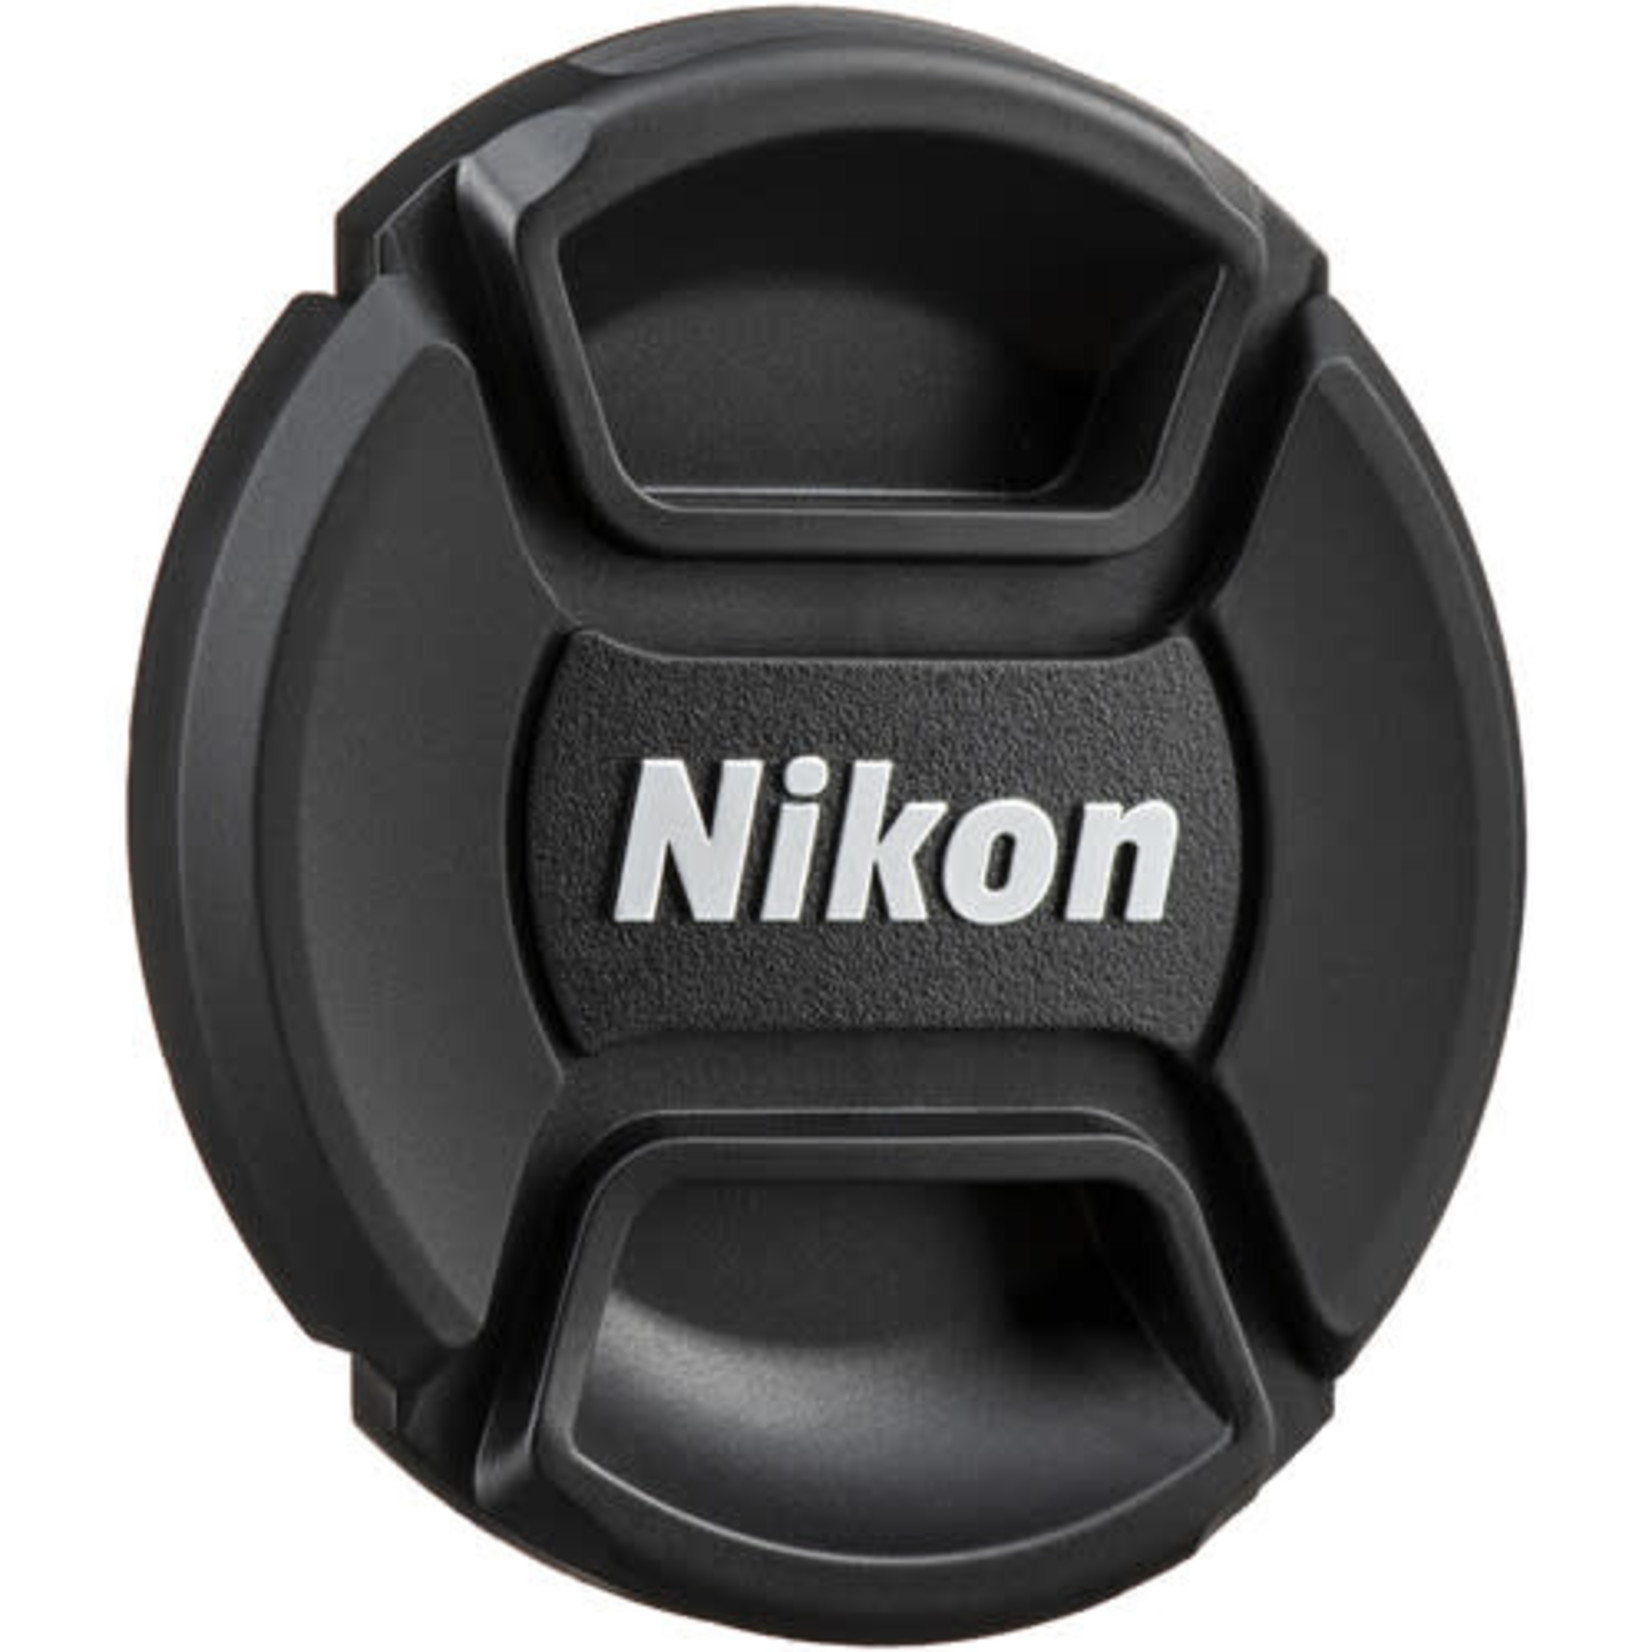 Nikon Nikon 67mm Snap-On Lens Cap